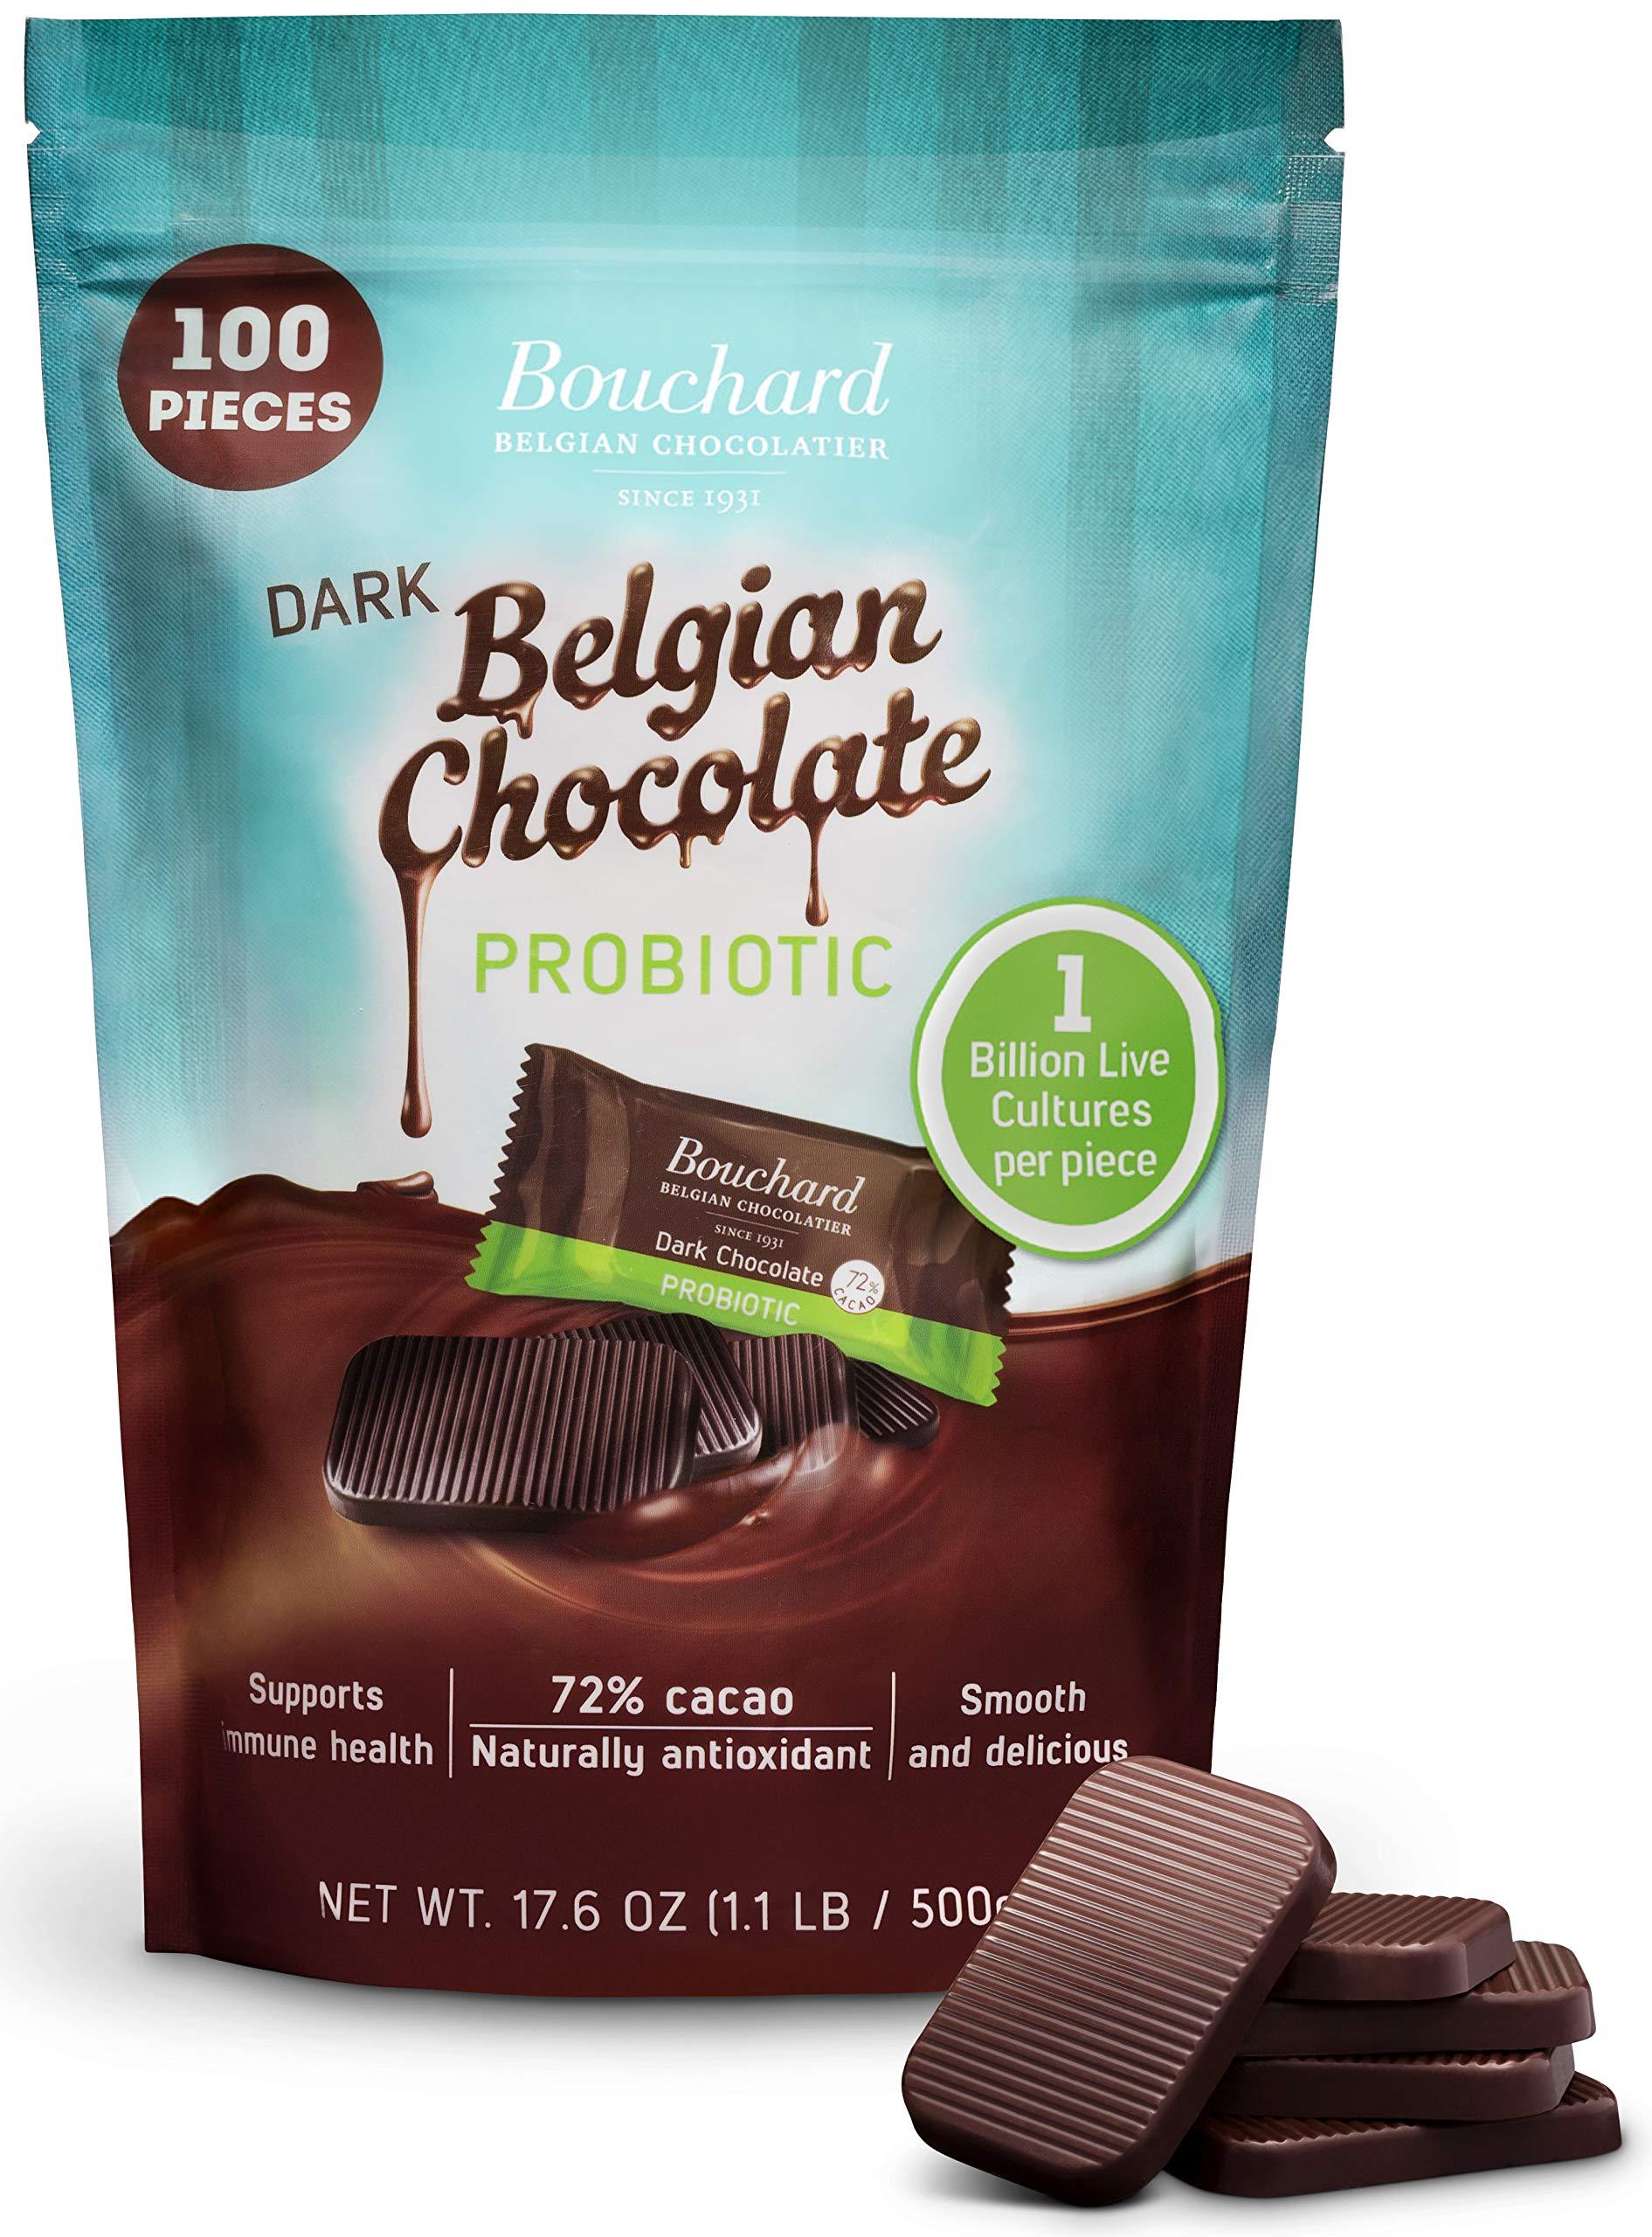 Bouchard Belgian Dark Chocolate Gluten-Free 72 % Cacao with Probiotics (100 Pieces)